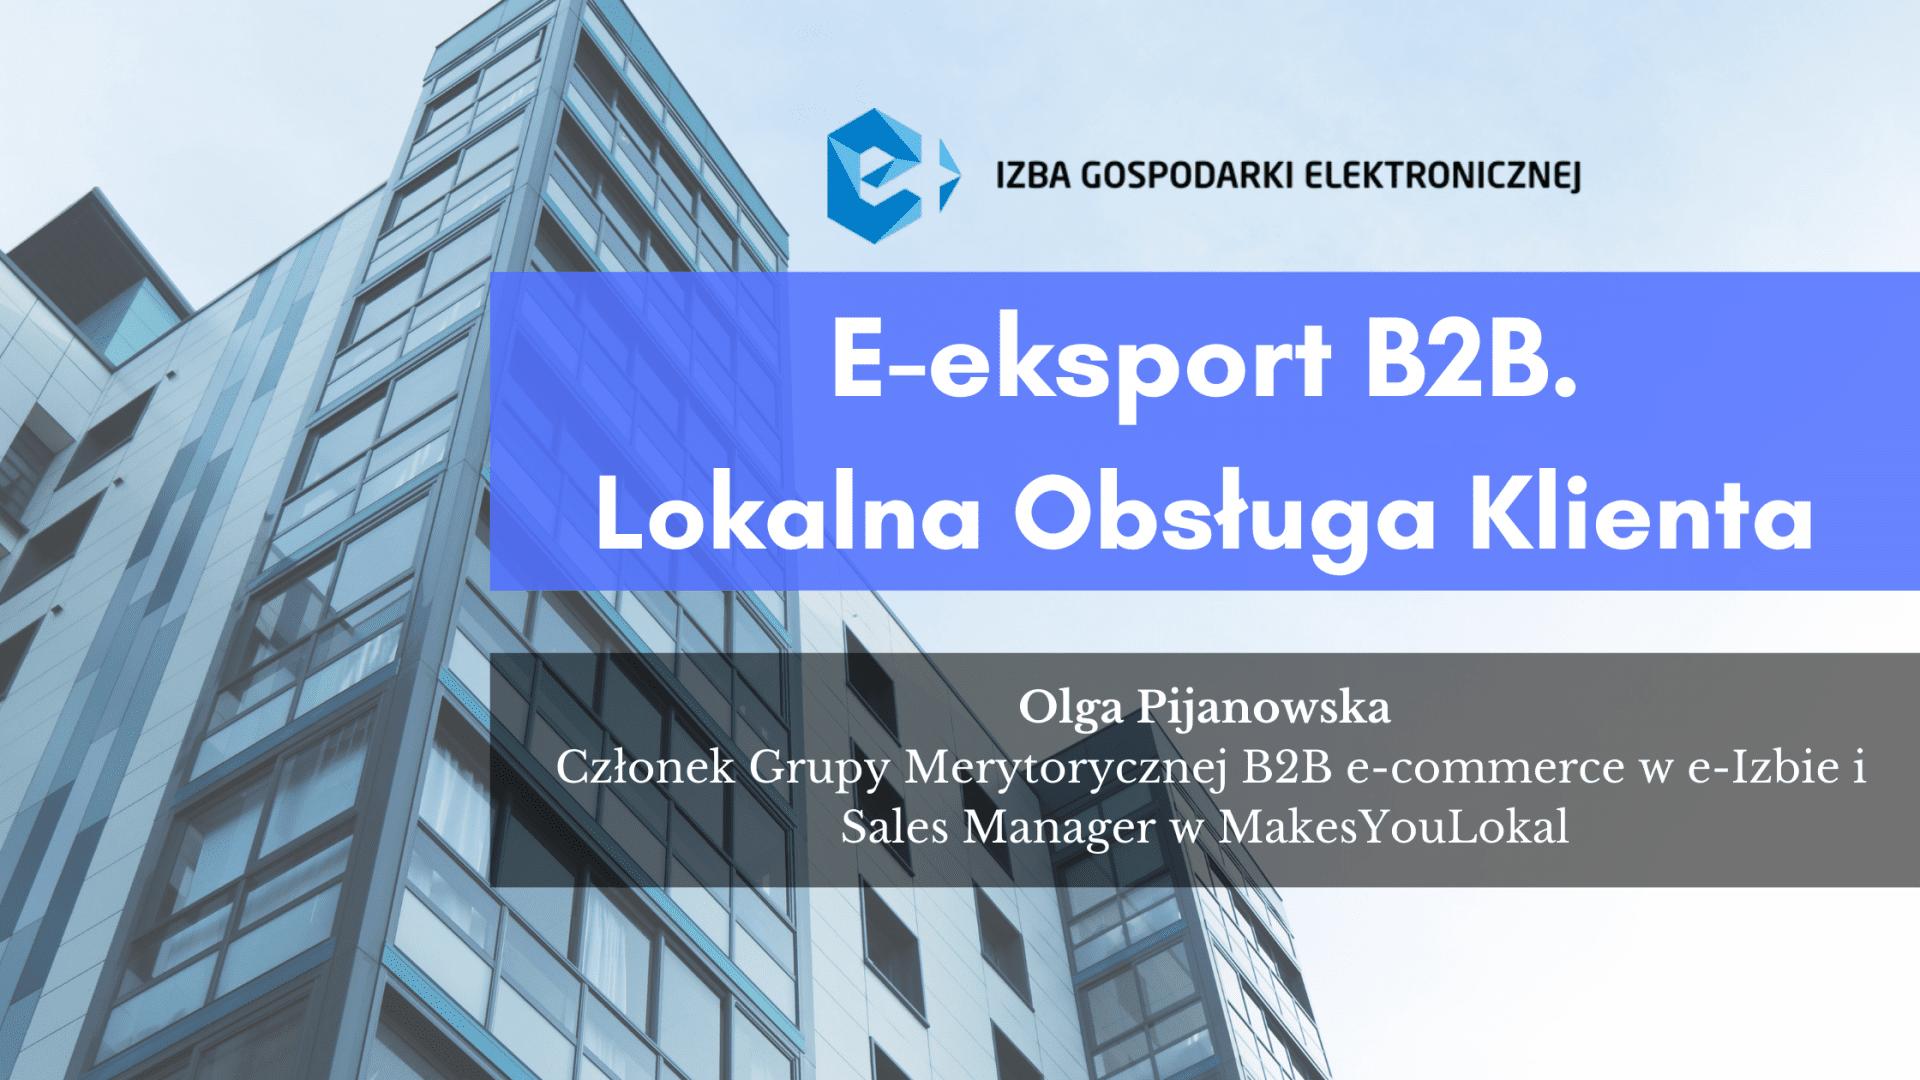 E-eksport B2B. Lokalna obsługa klienta.